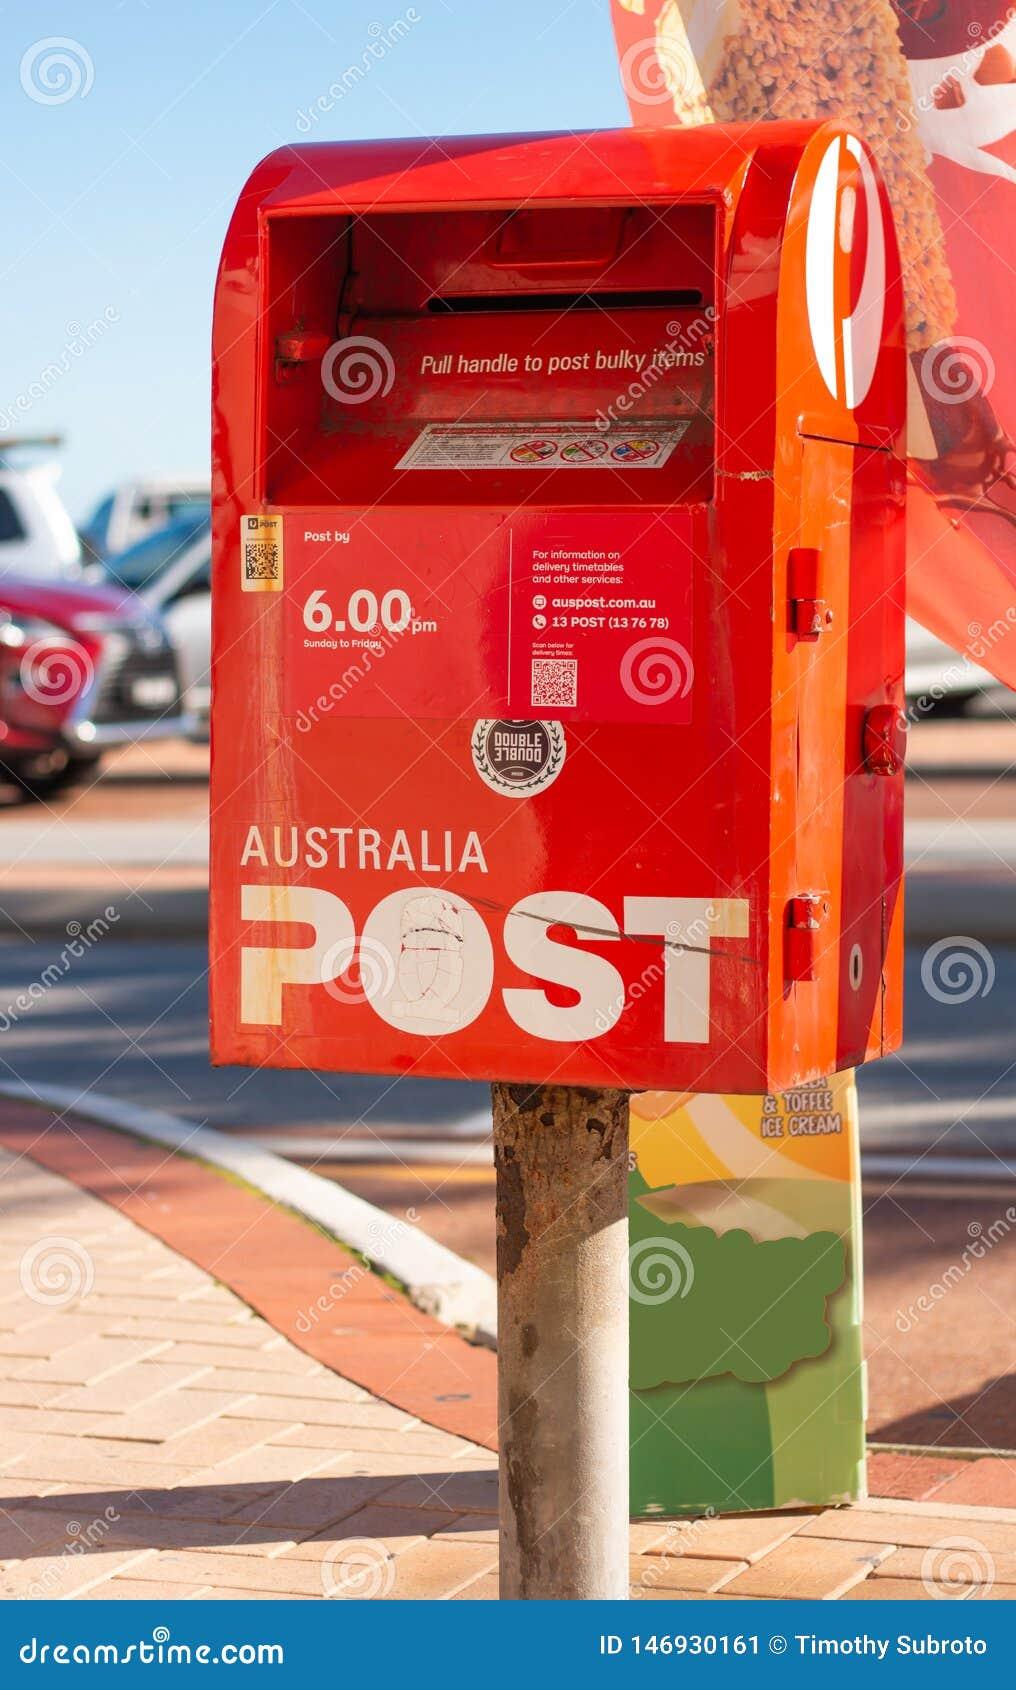 Australia Post Mailbox in a street